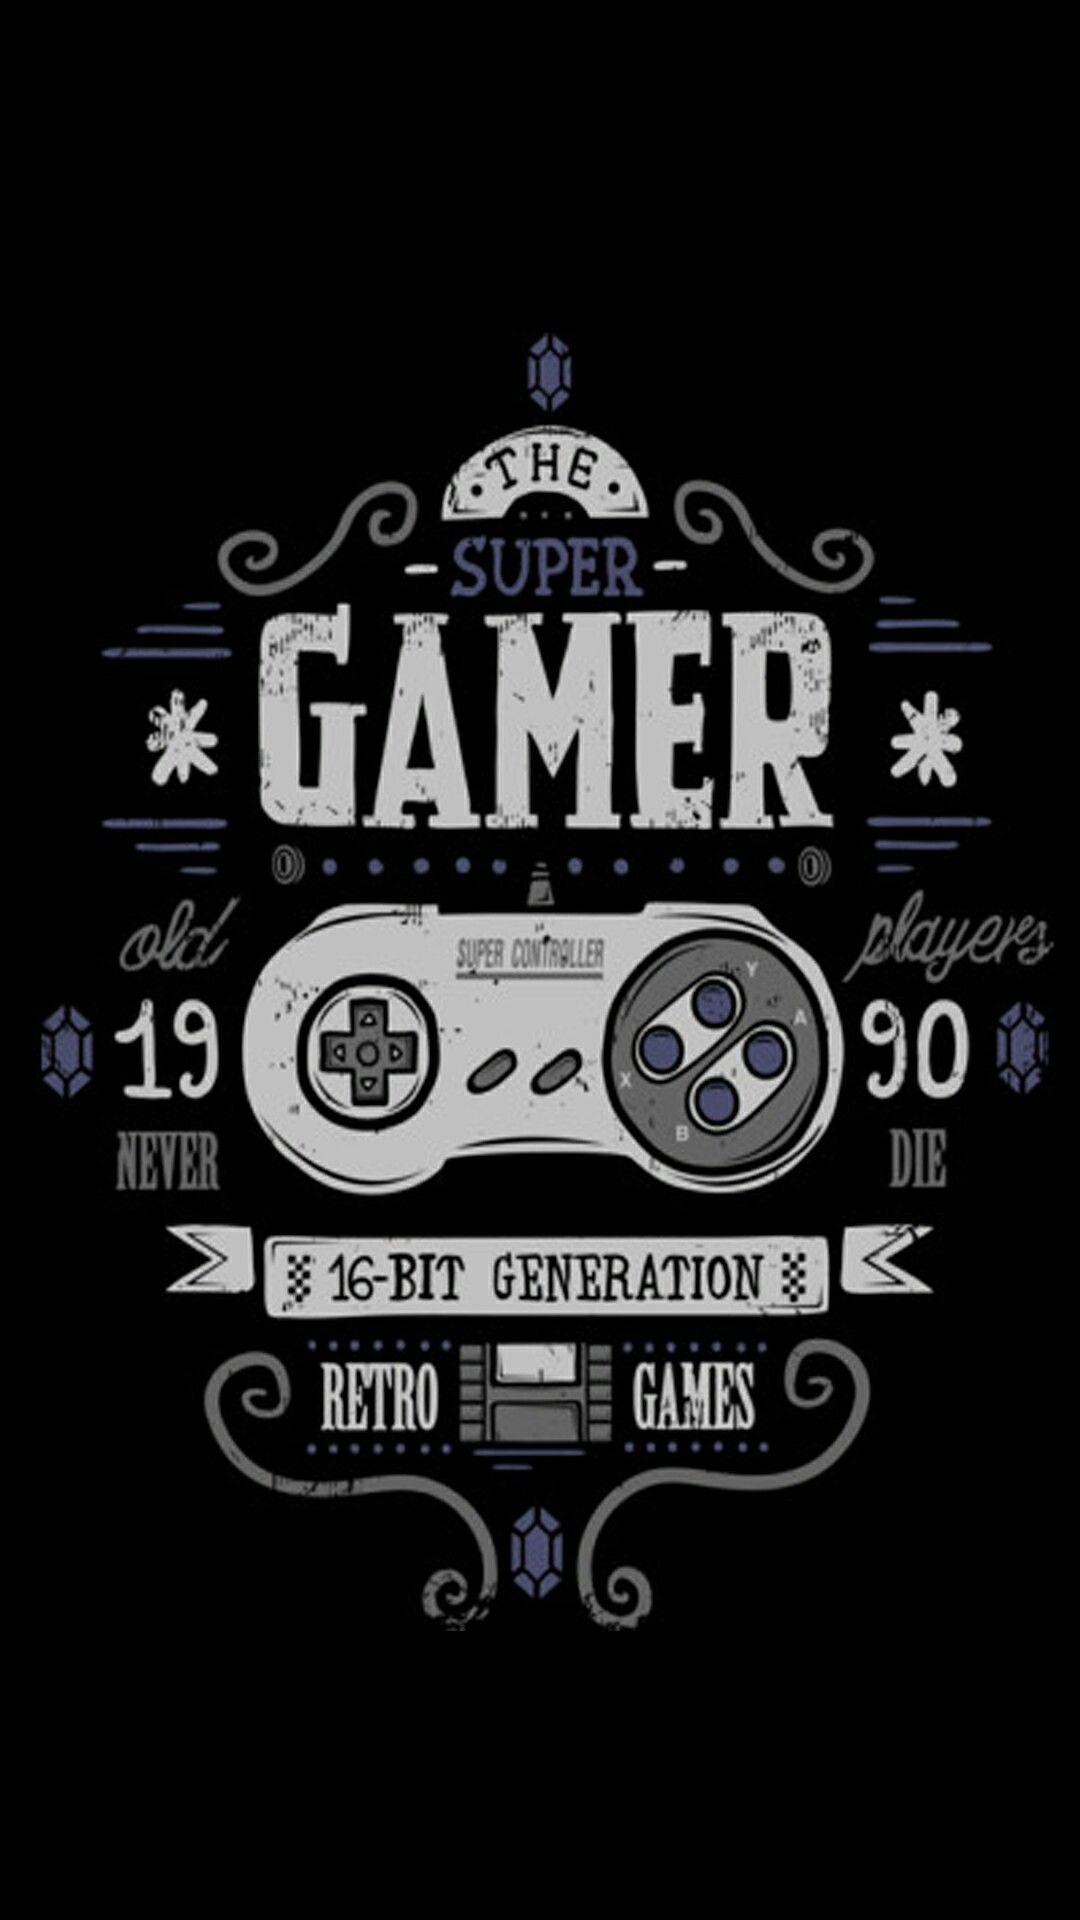 Retro gaming wallpaper